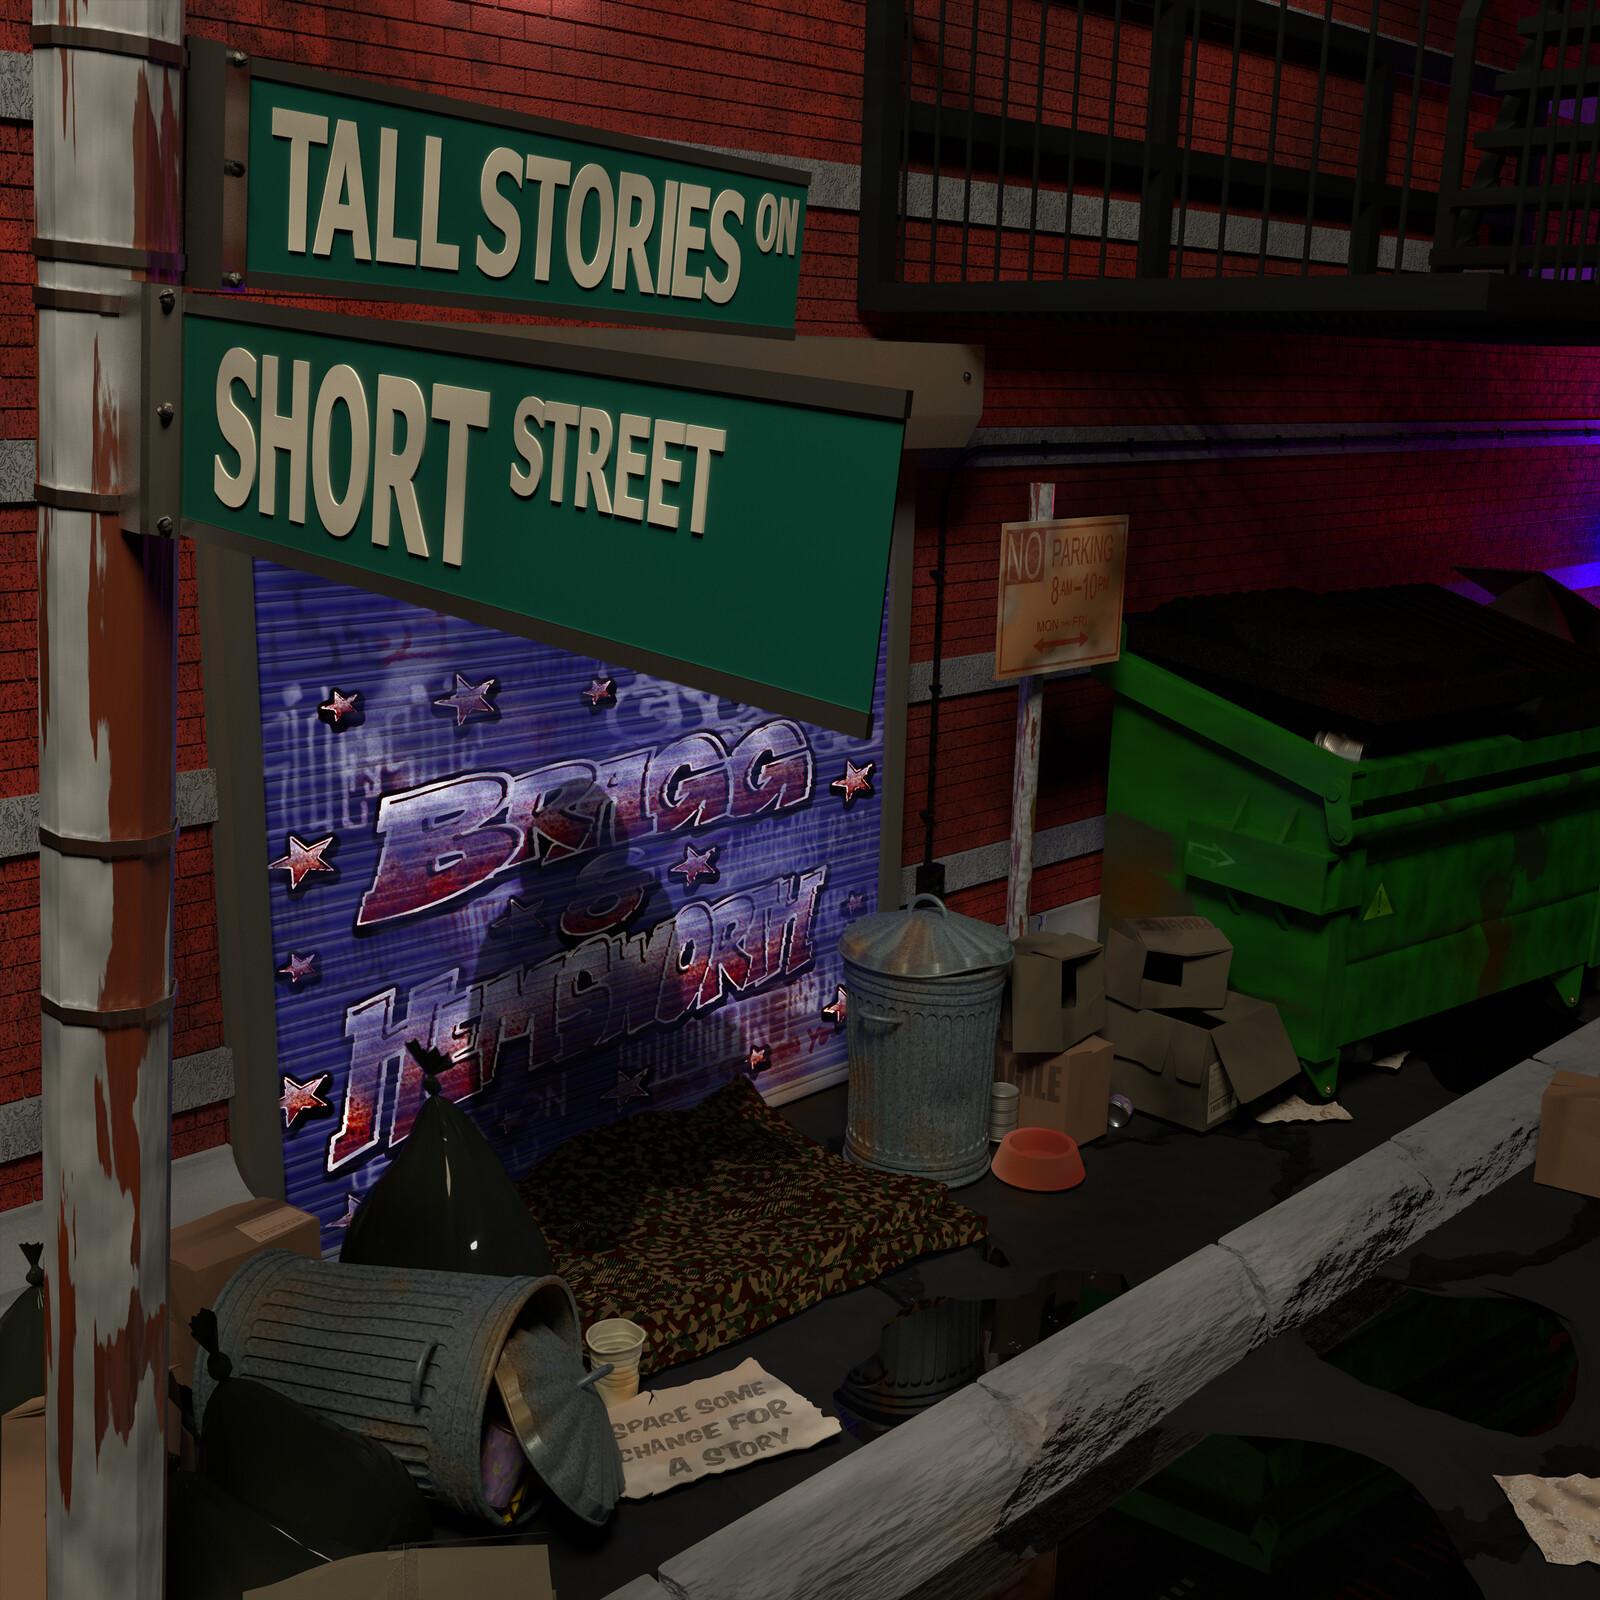 Tall Stories on Short Street